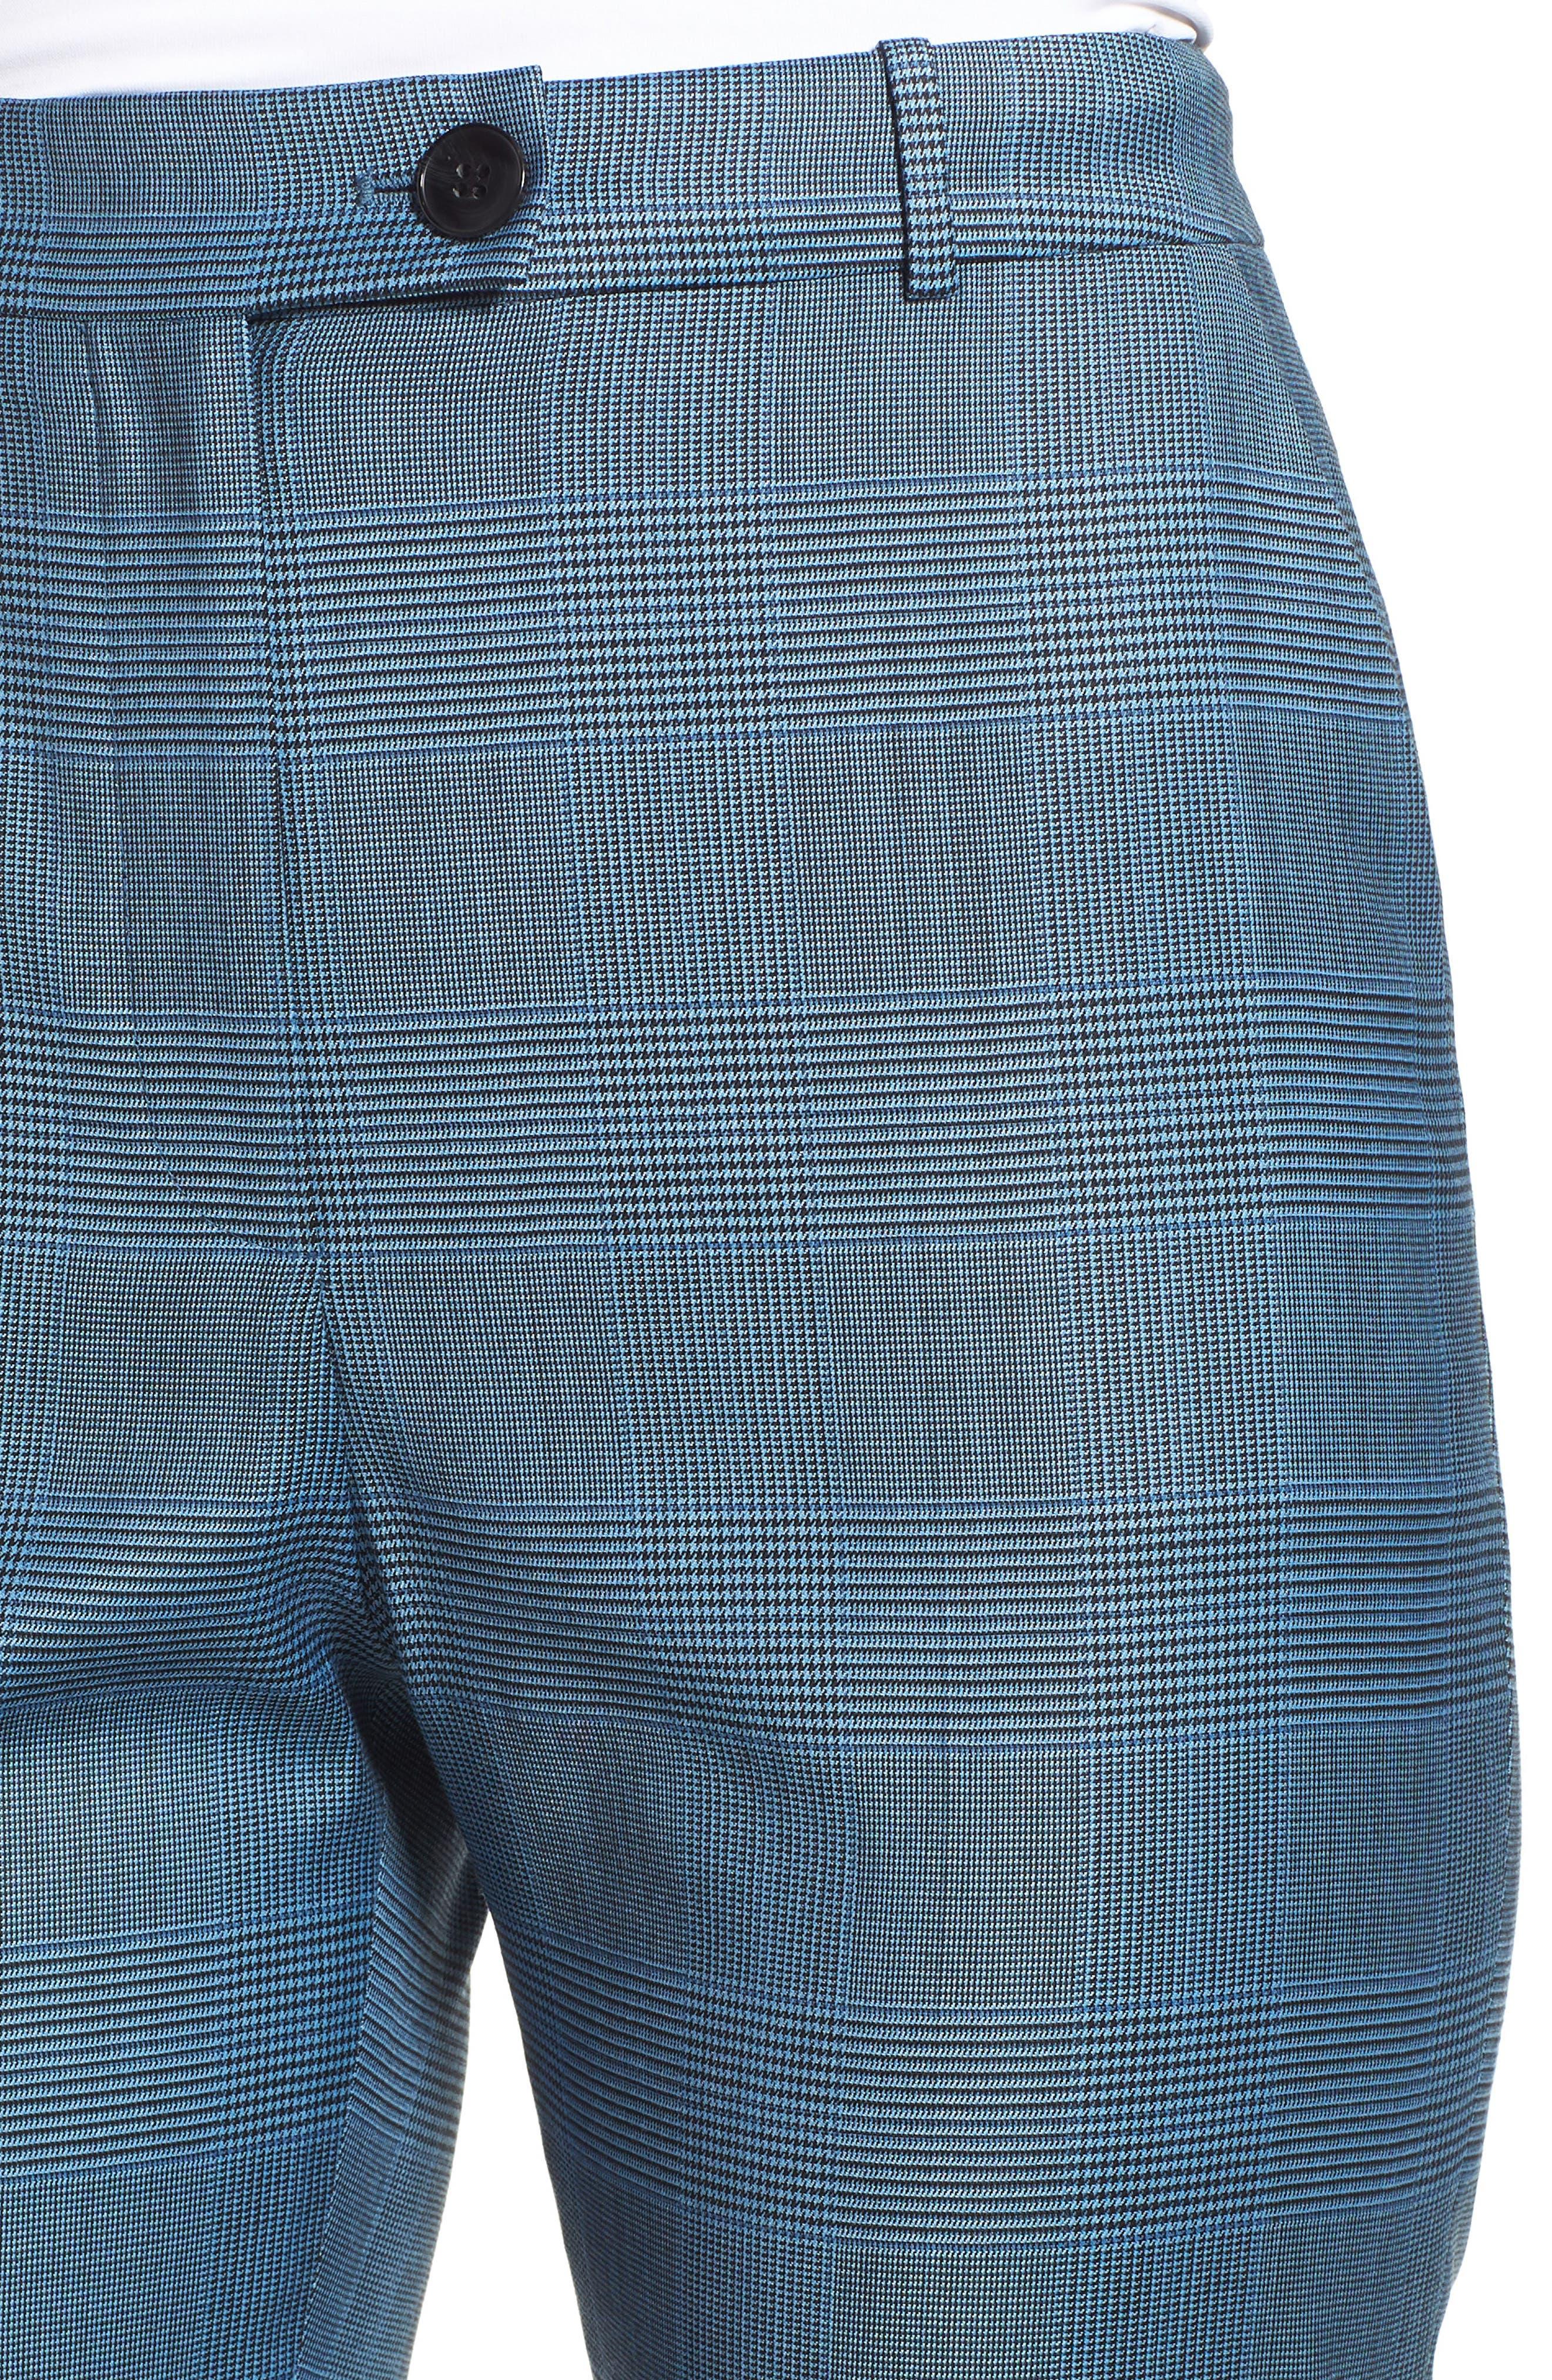 Tofilia Glencheck Slim Fit Trousers,                             Alternate thumbnail 4, color,                             Sailor Blue Fantasy